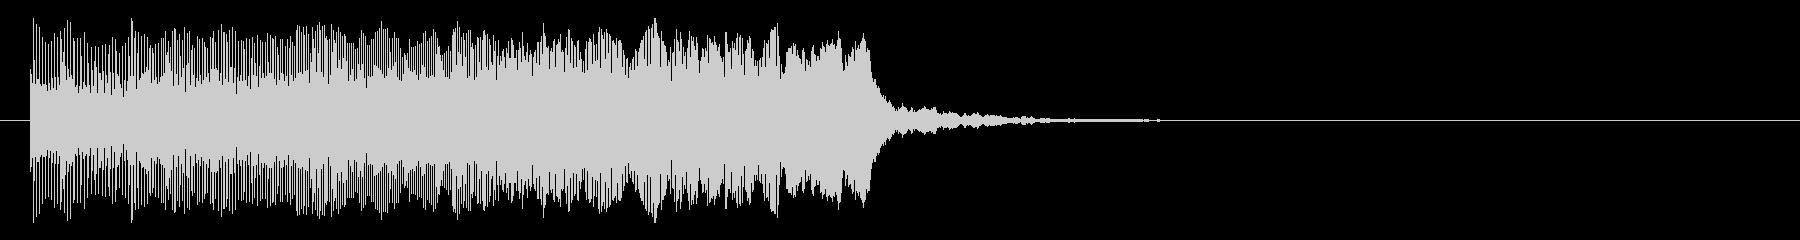 8bitパワーup-01-1_revの未再生の波形